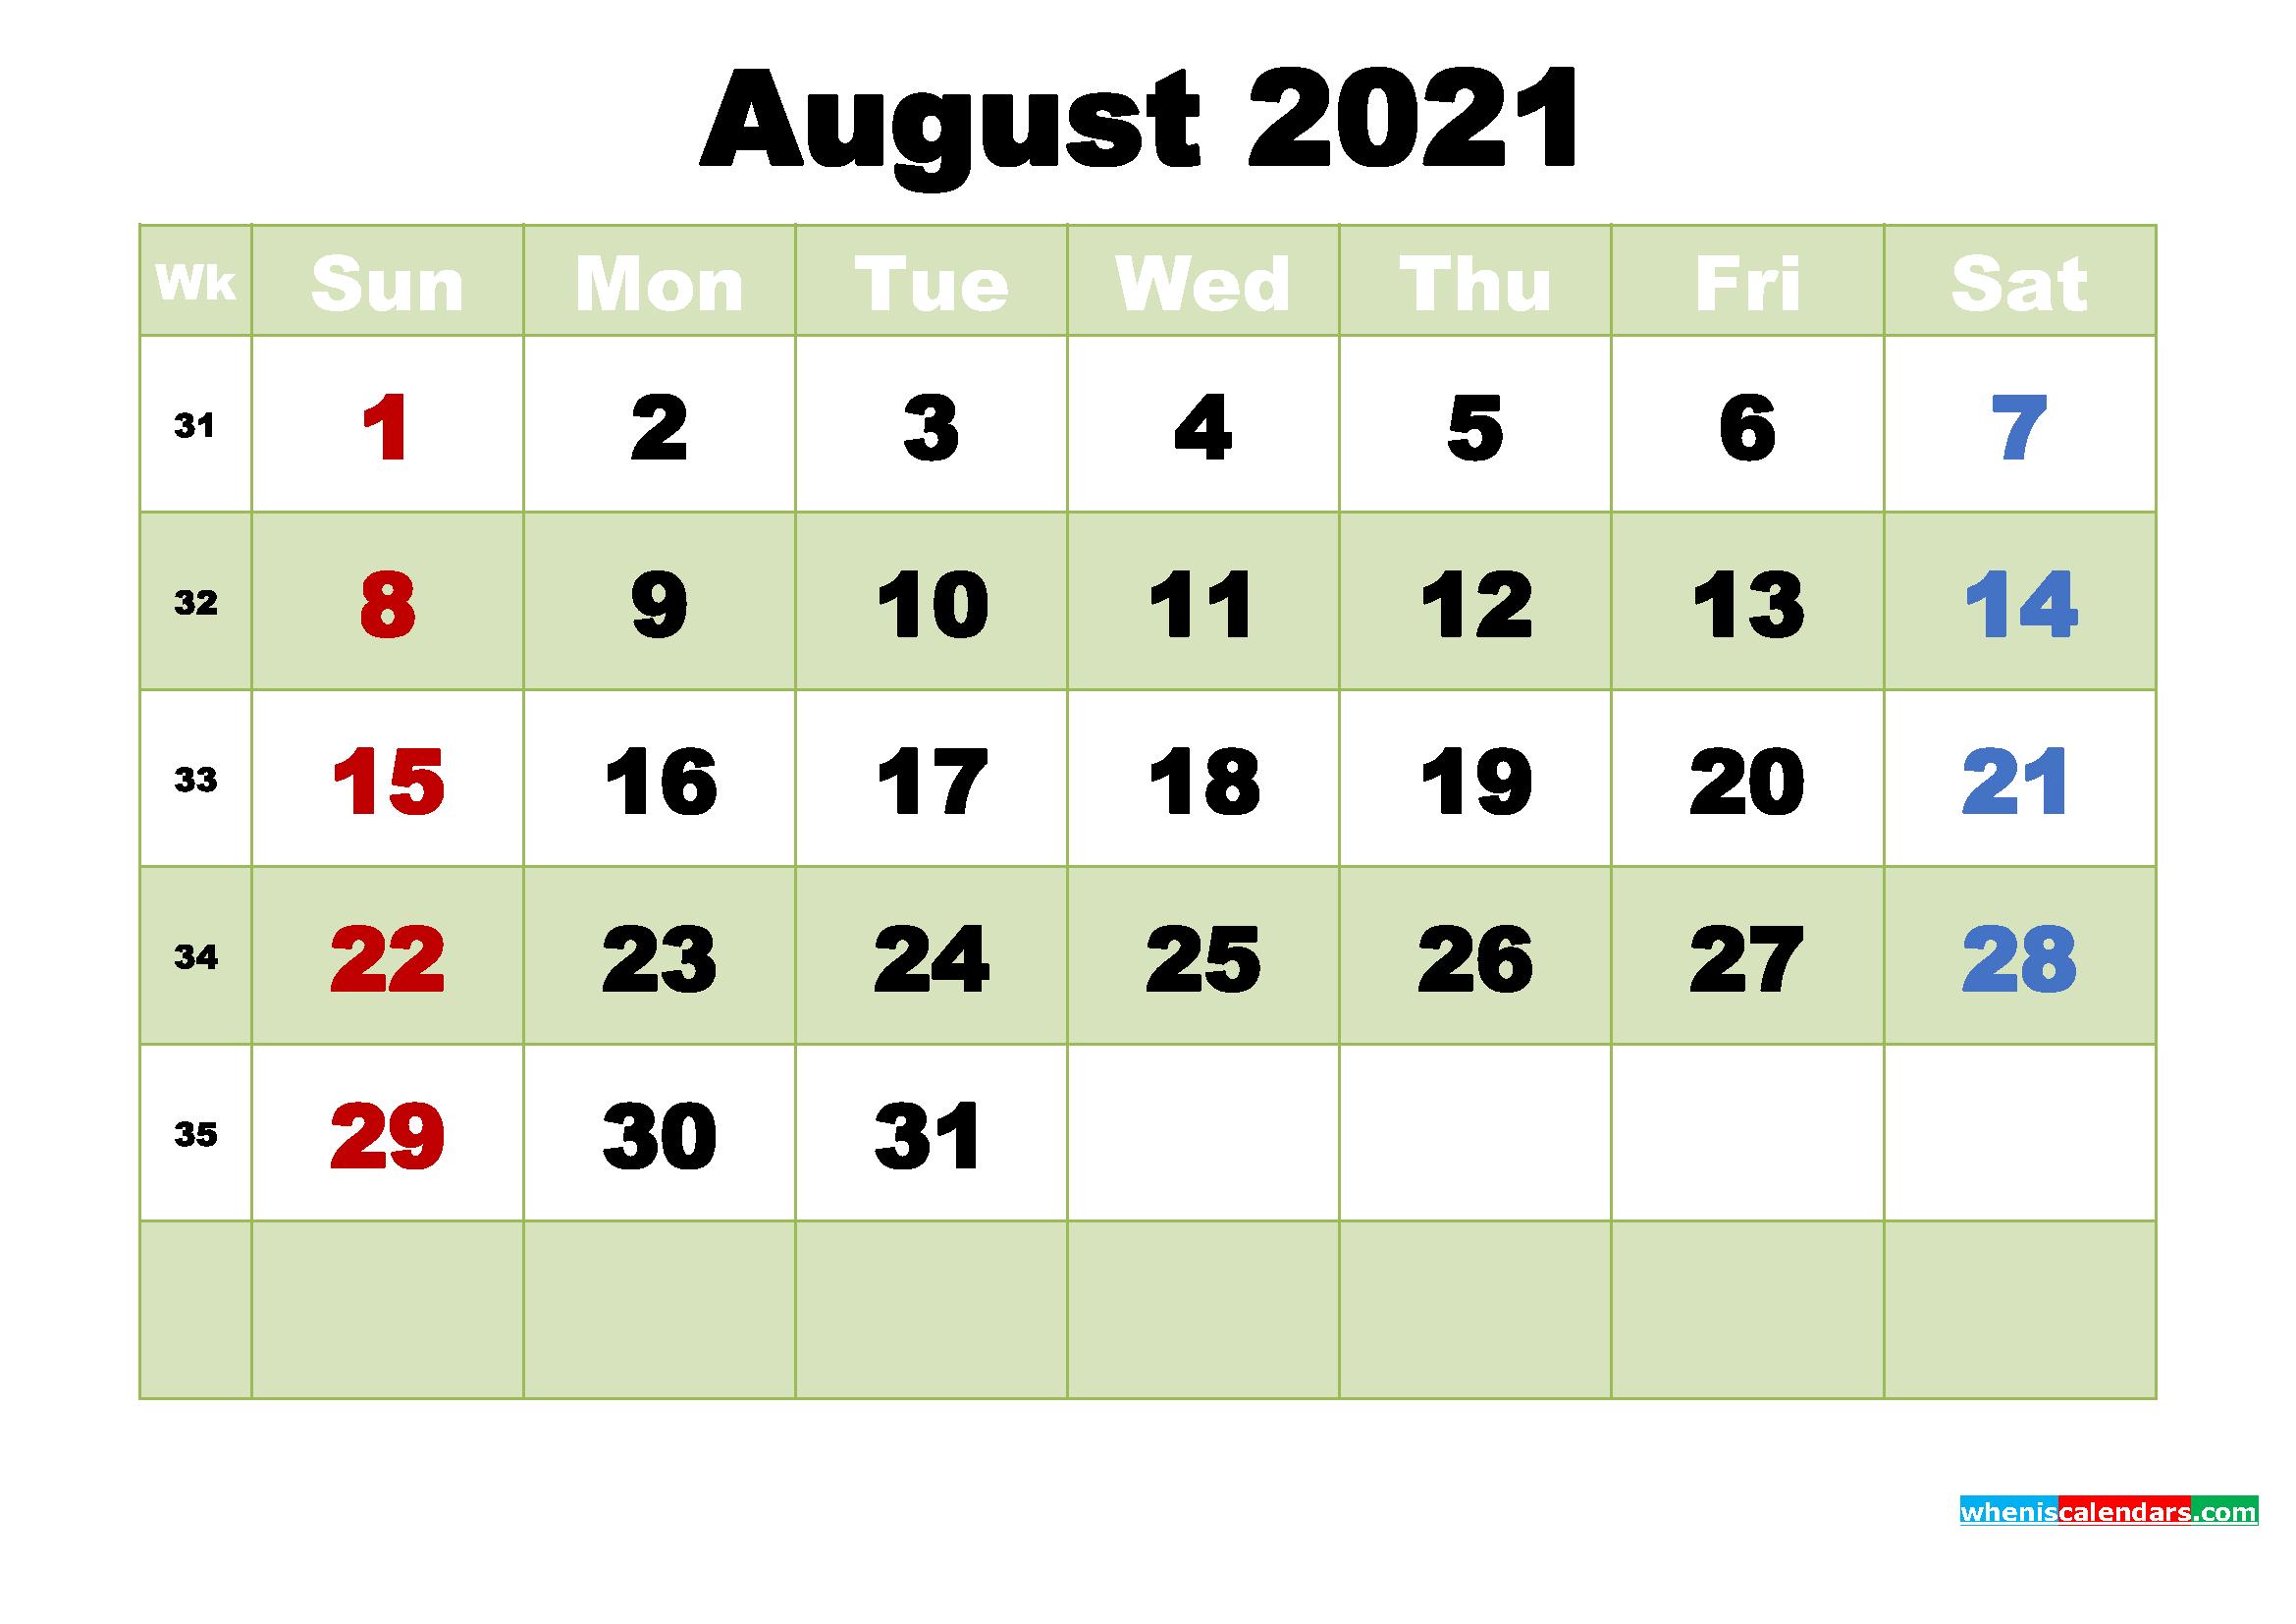 Free August 2021 Printable Calendar Template Word, PDF ...